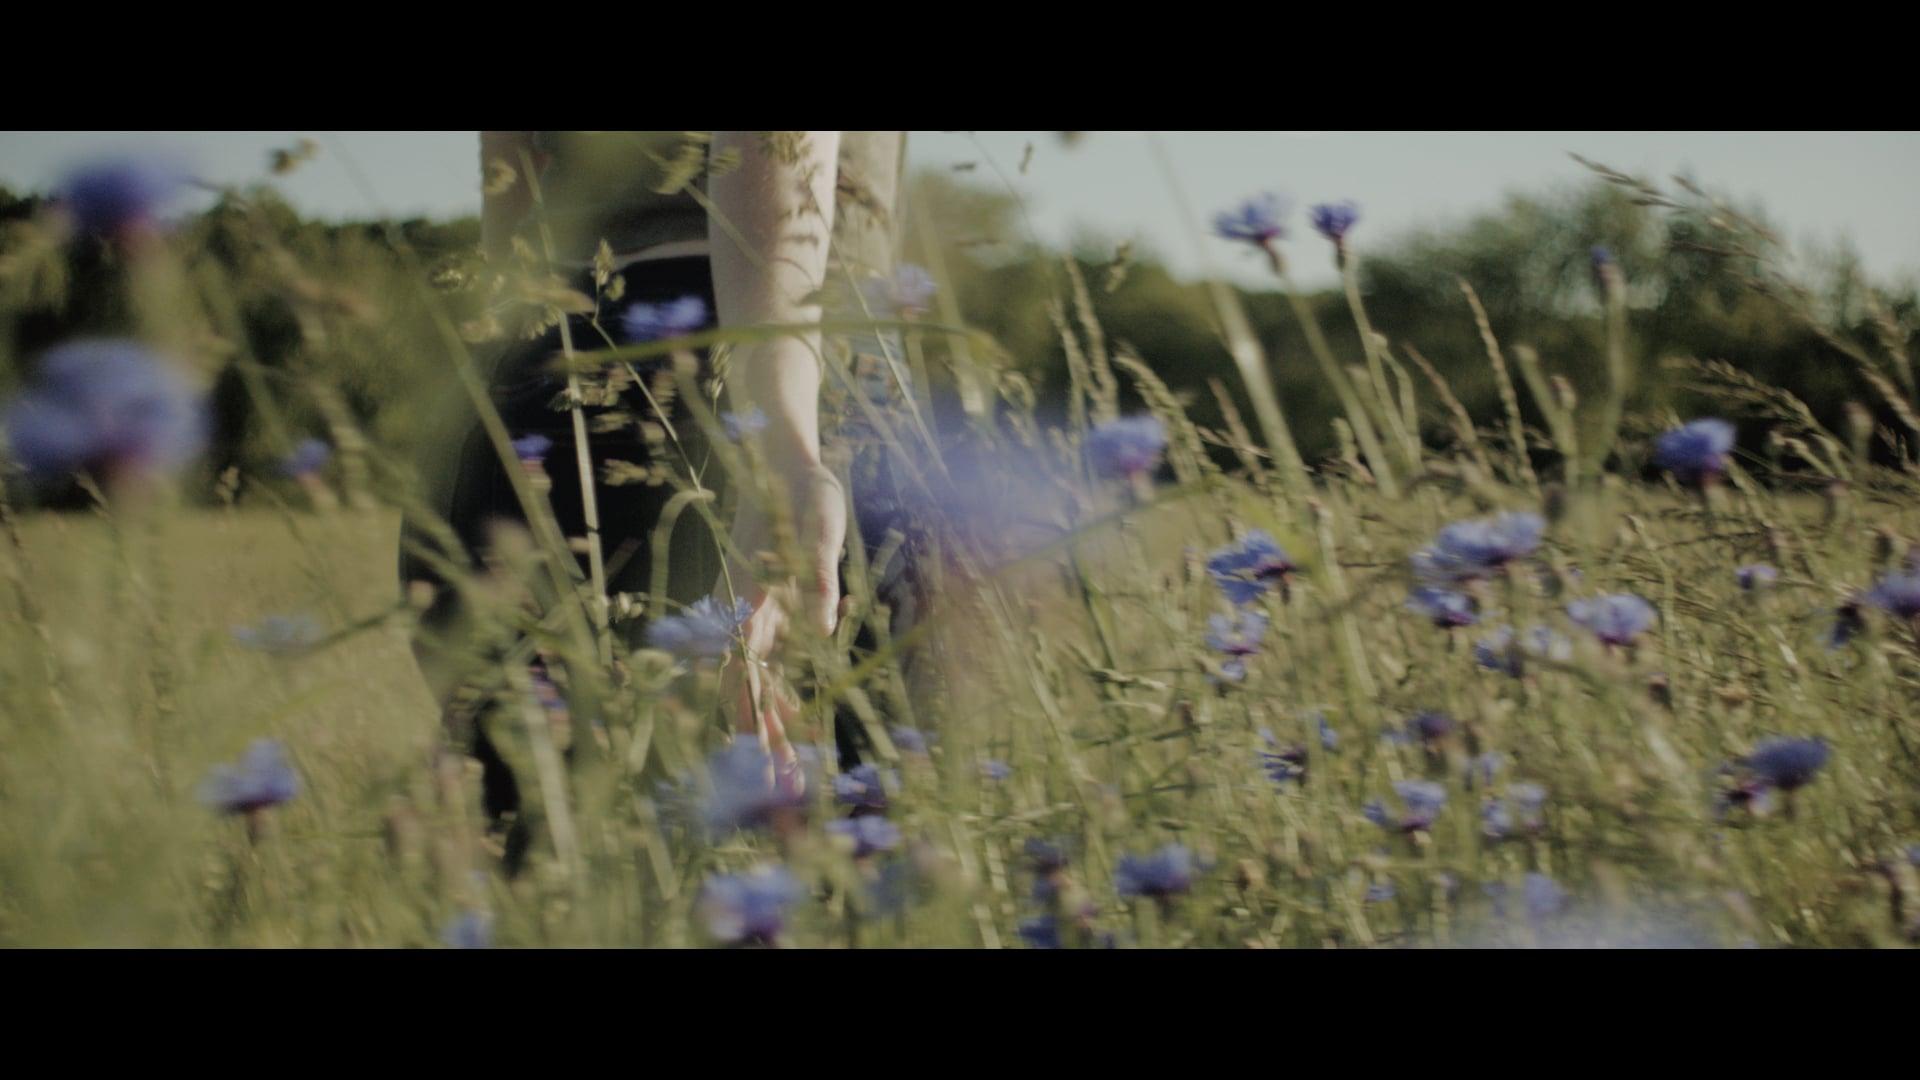 Skylark (2020) | ARRI ALEXA Short Film